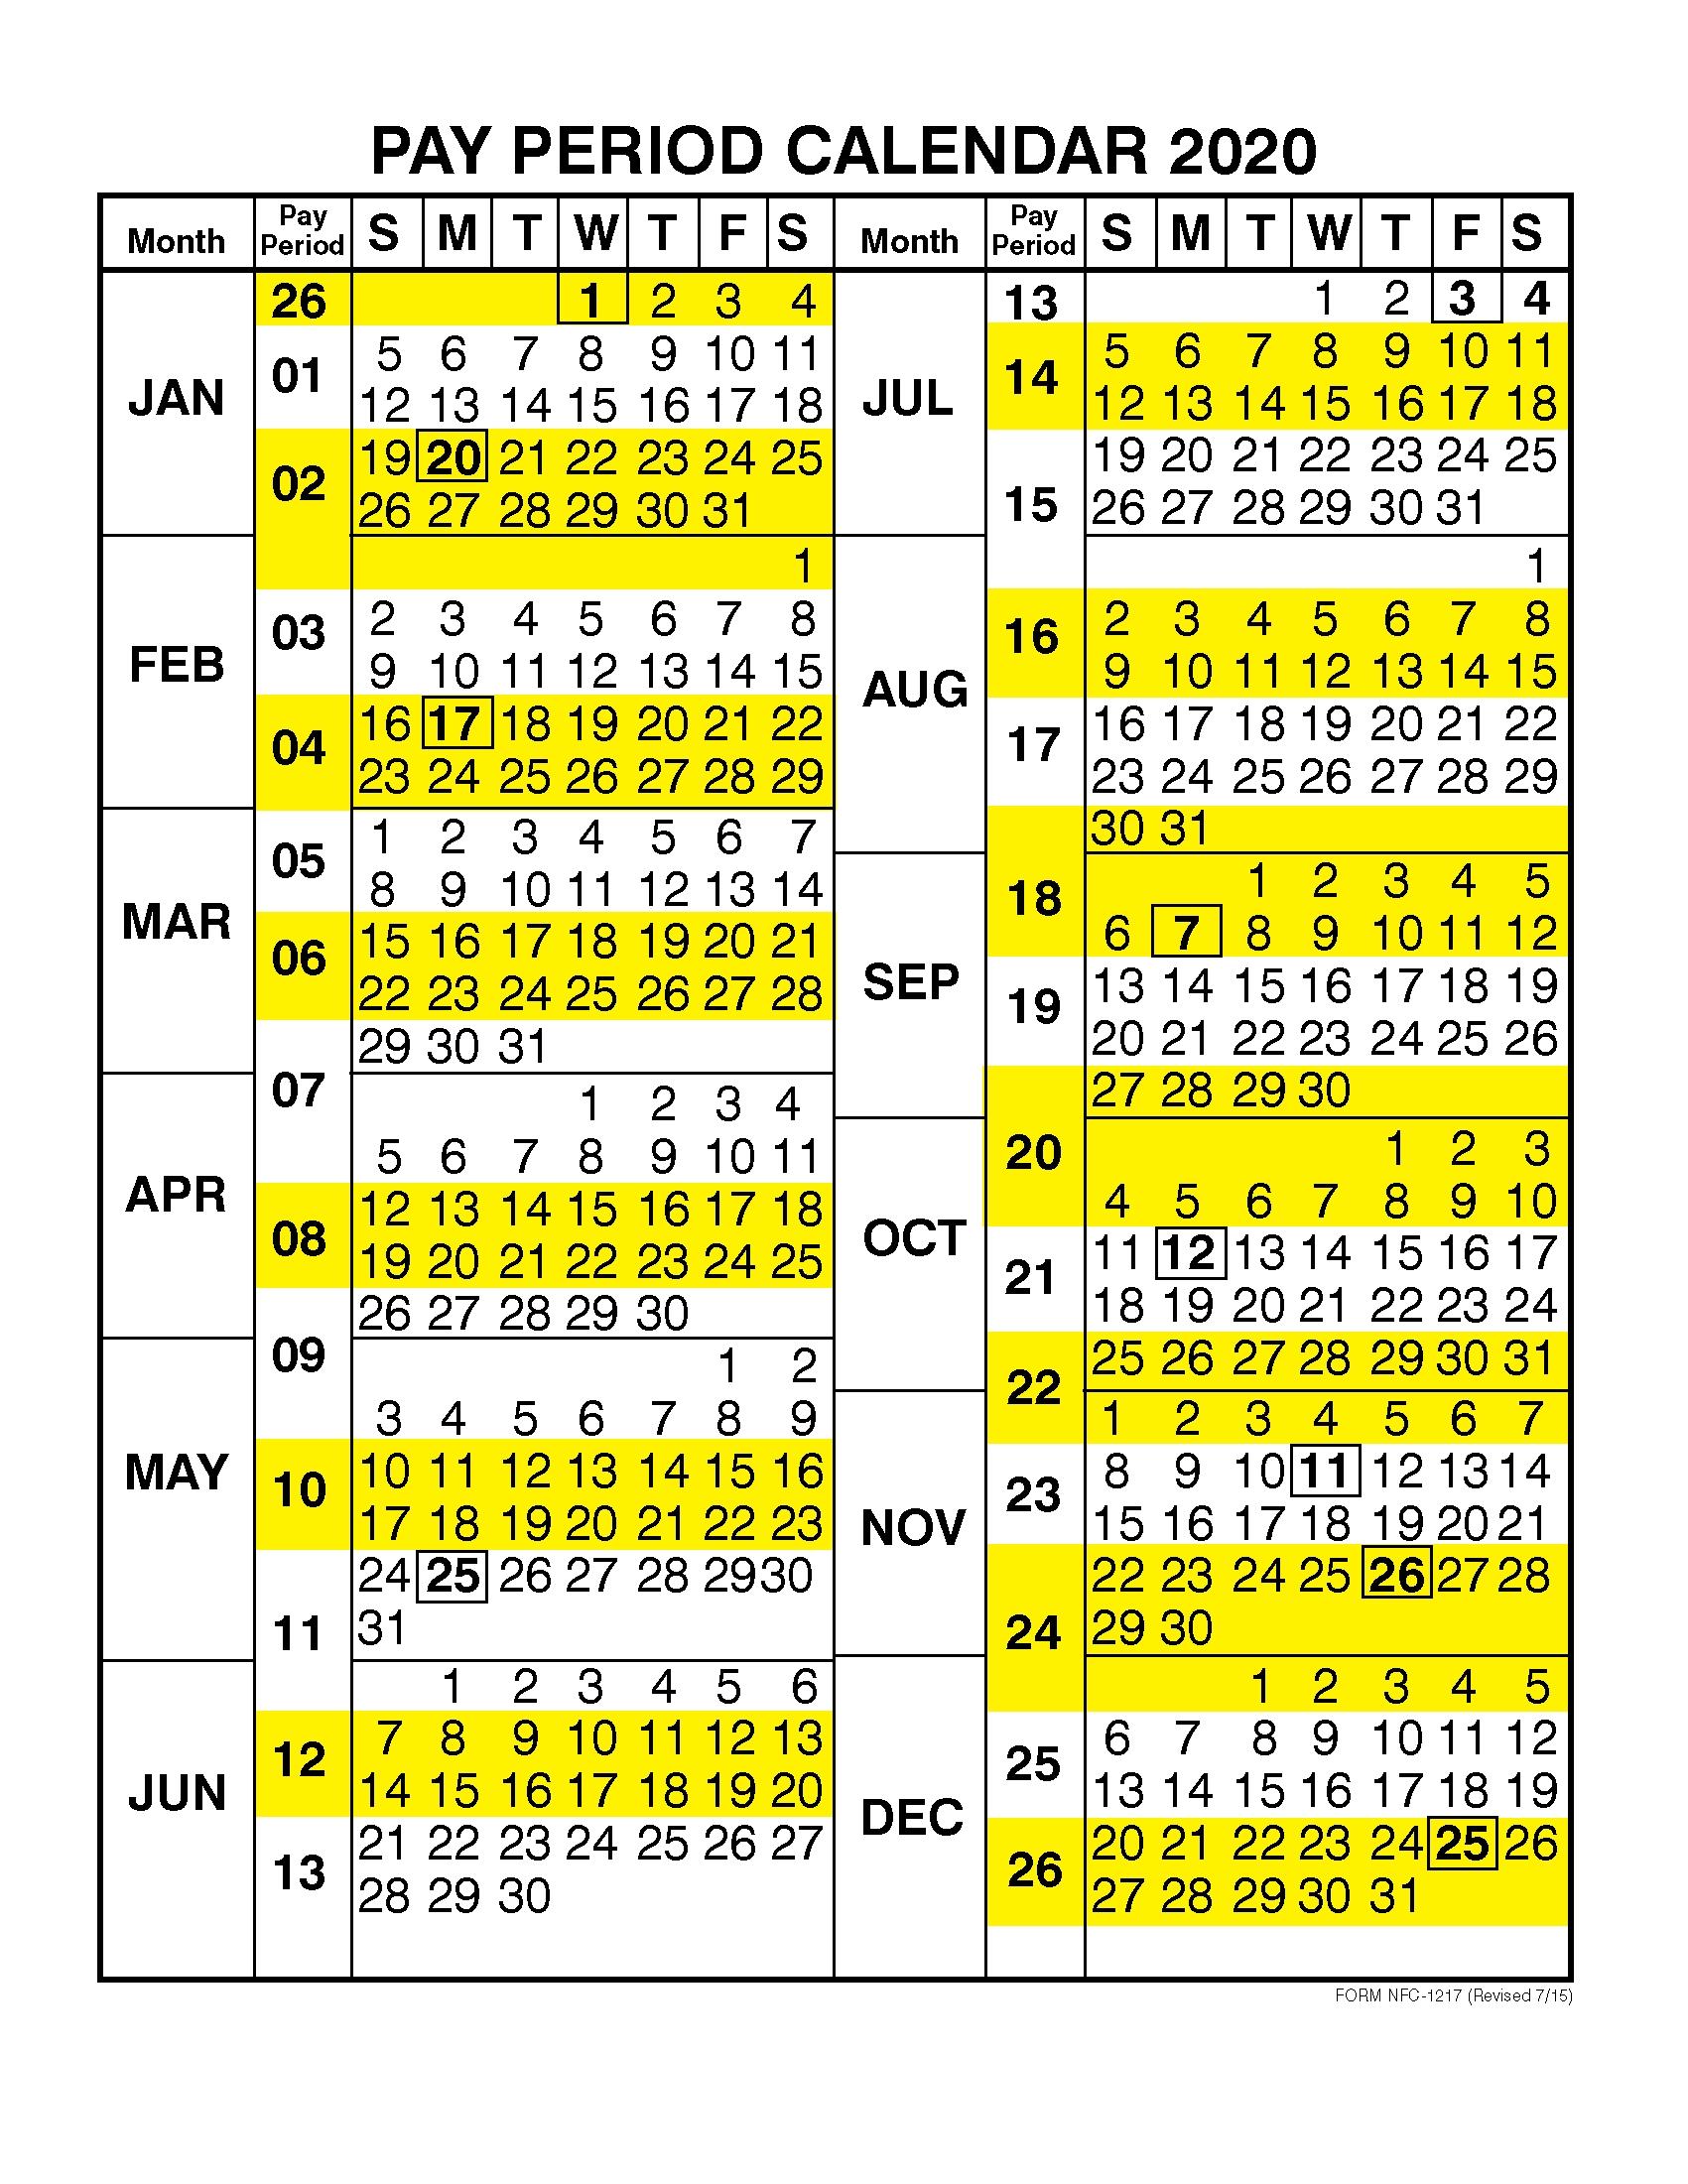 Dfas Payroll Calendar 2020 | 2021 Pay Periods Calendar